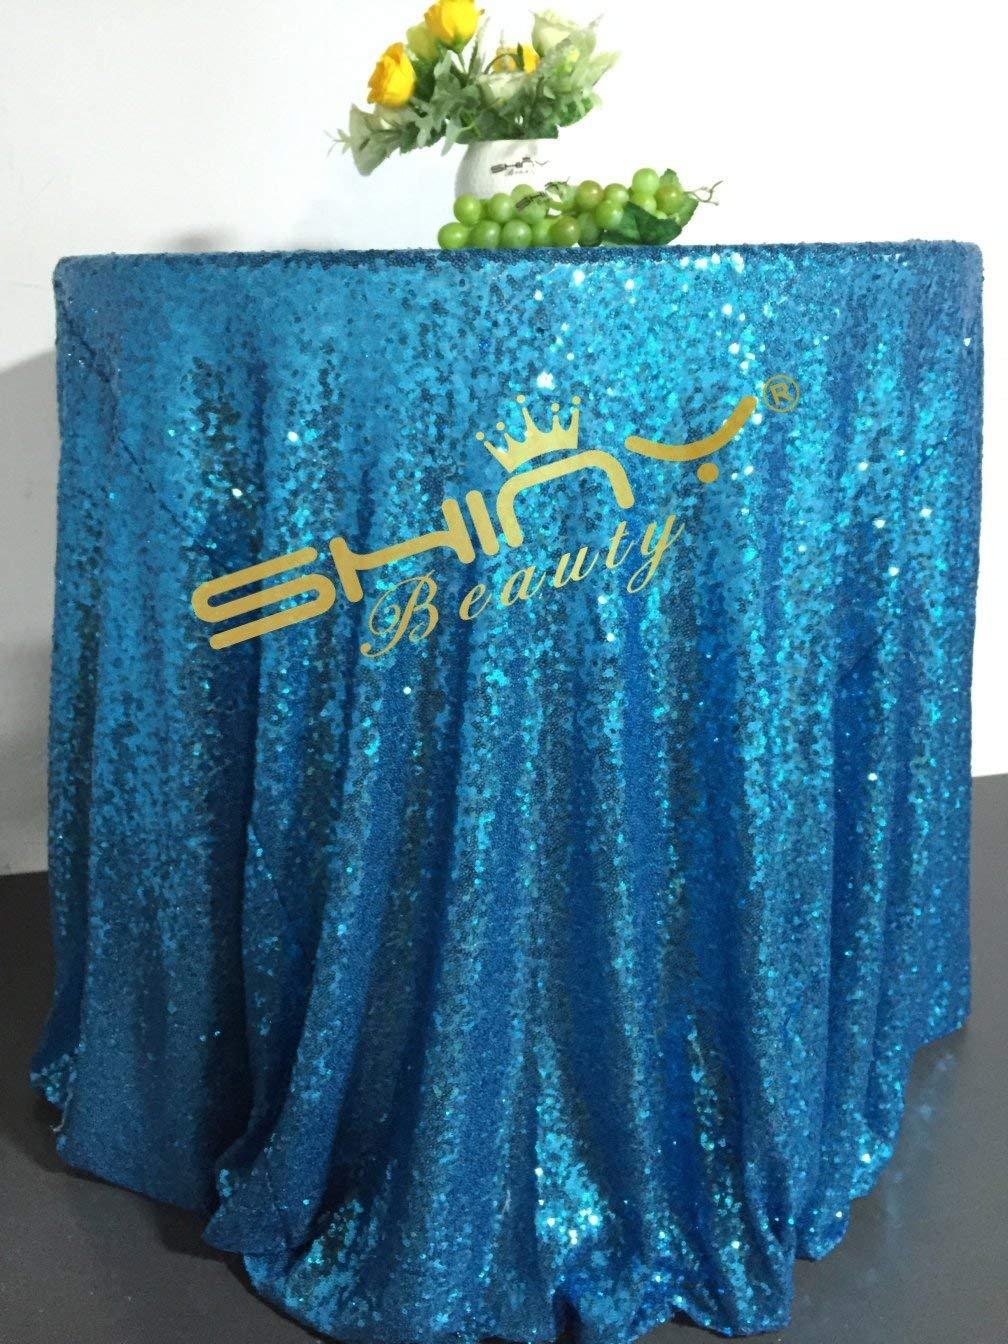 ShinyBeauty 72-Inch Round Sequin Tablecloth-Light Blue, Sequin Table Linen Overlay (Light Blue)